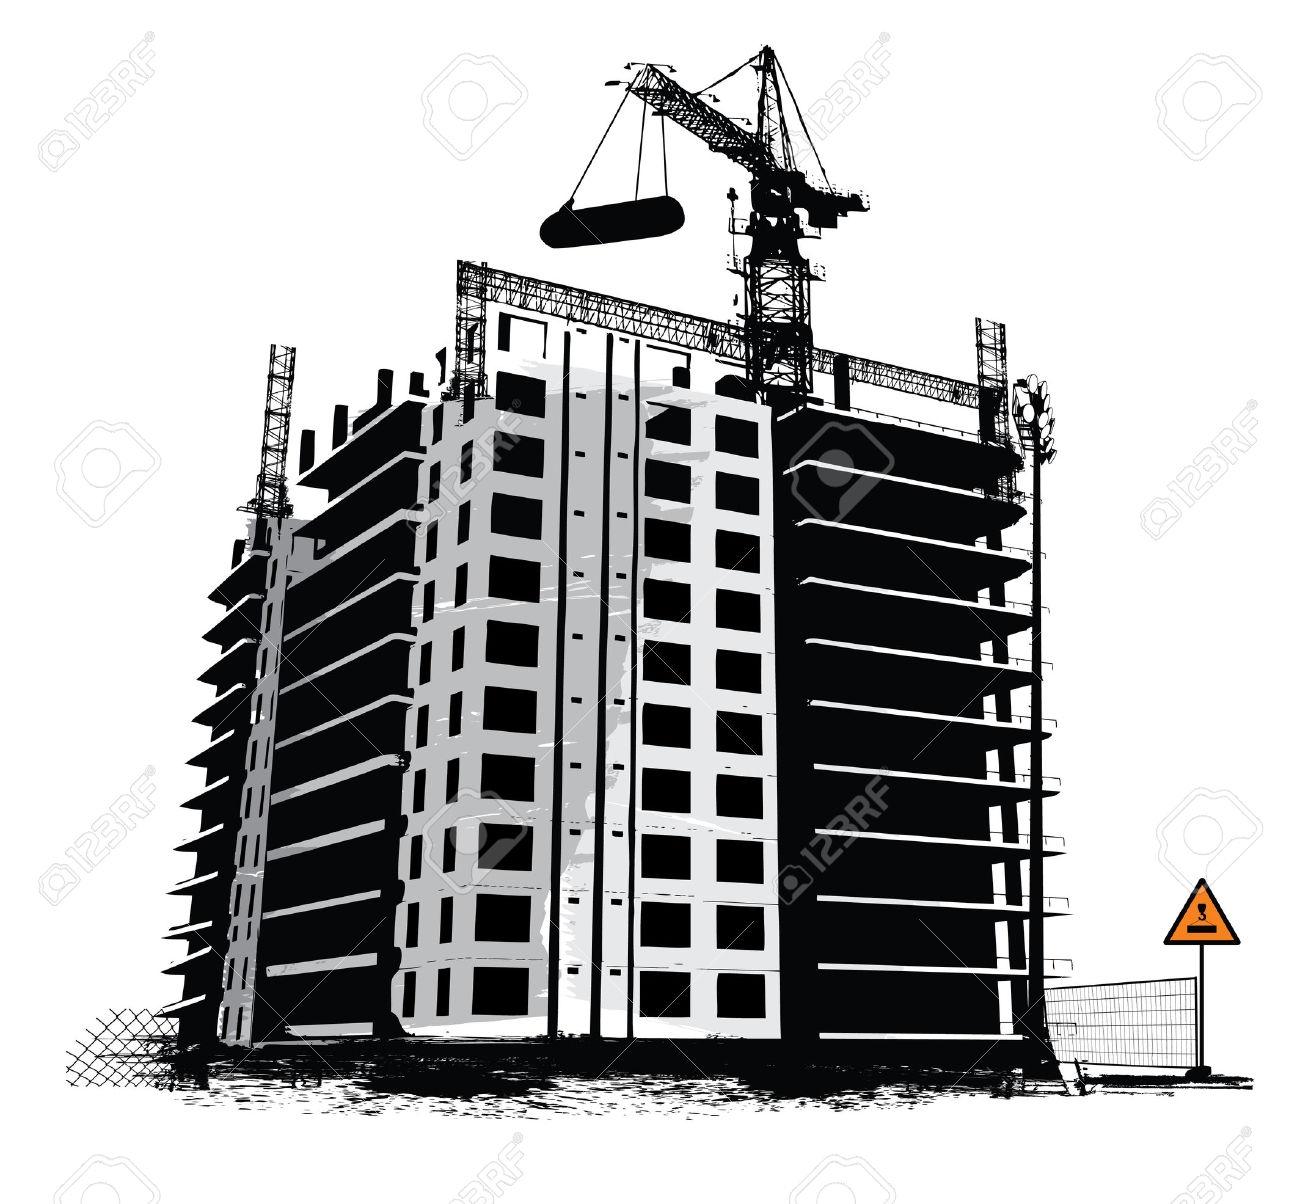 Building construction site clipart vector freeuse download Building construction clipart - ClipartFest vector freeuse download